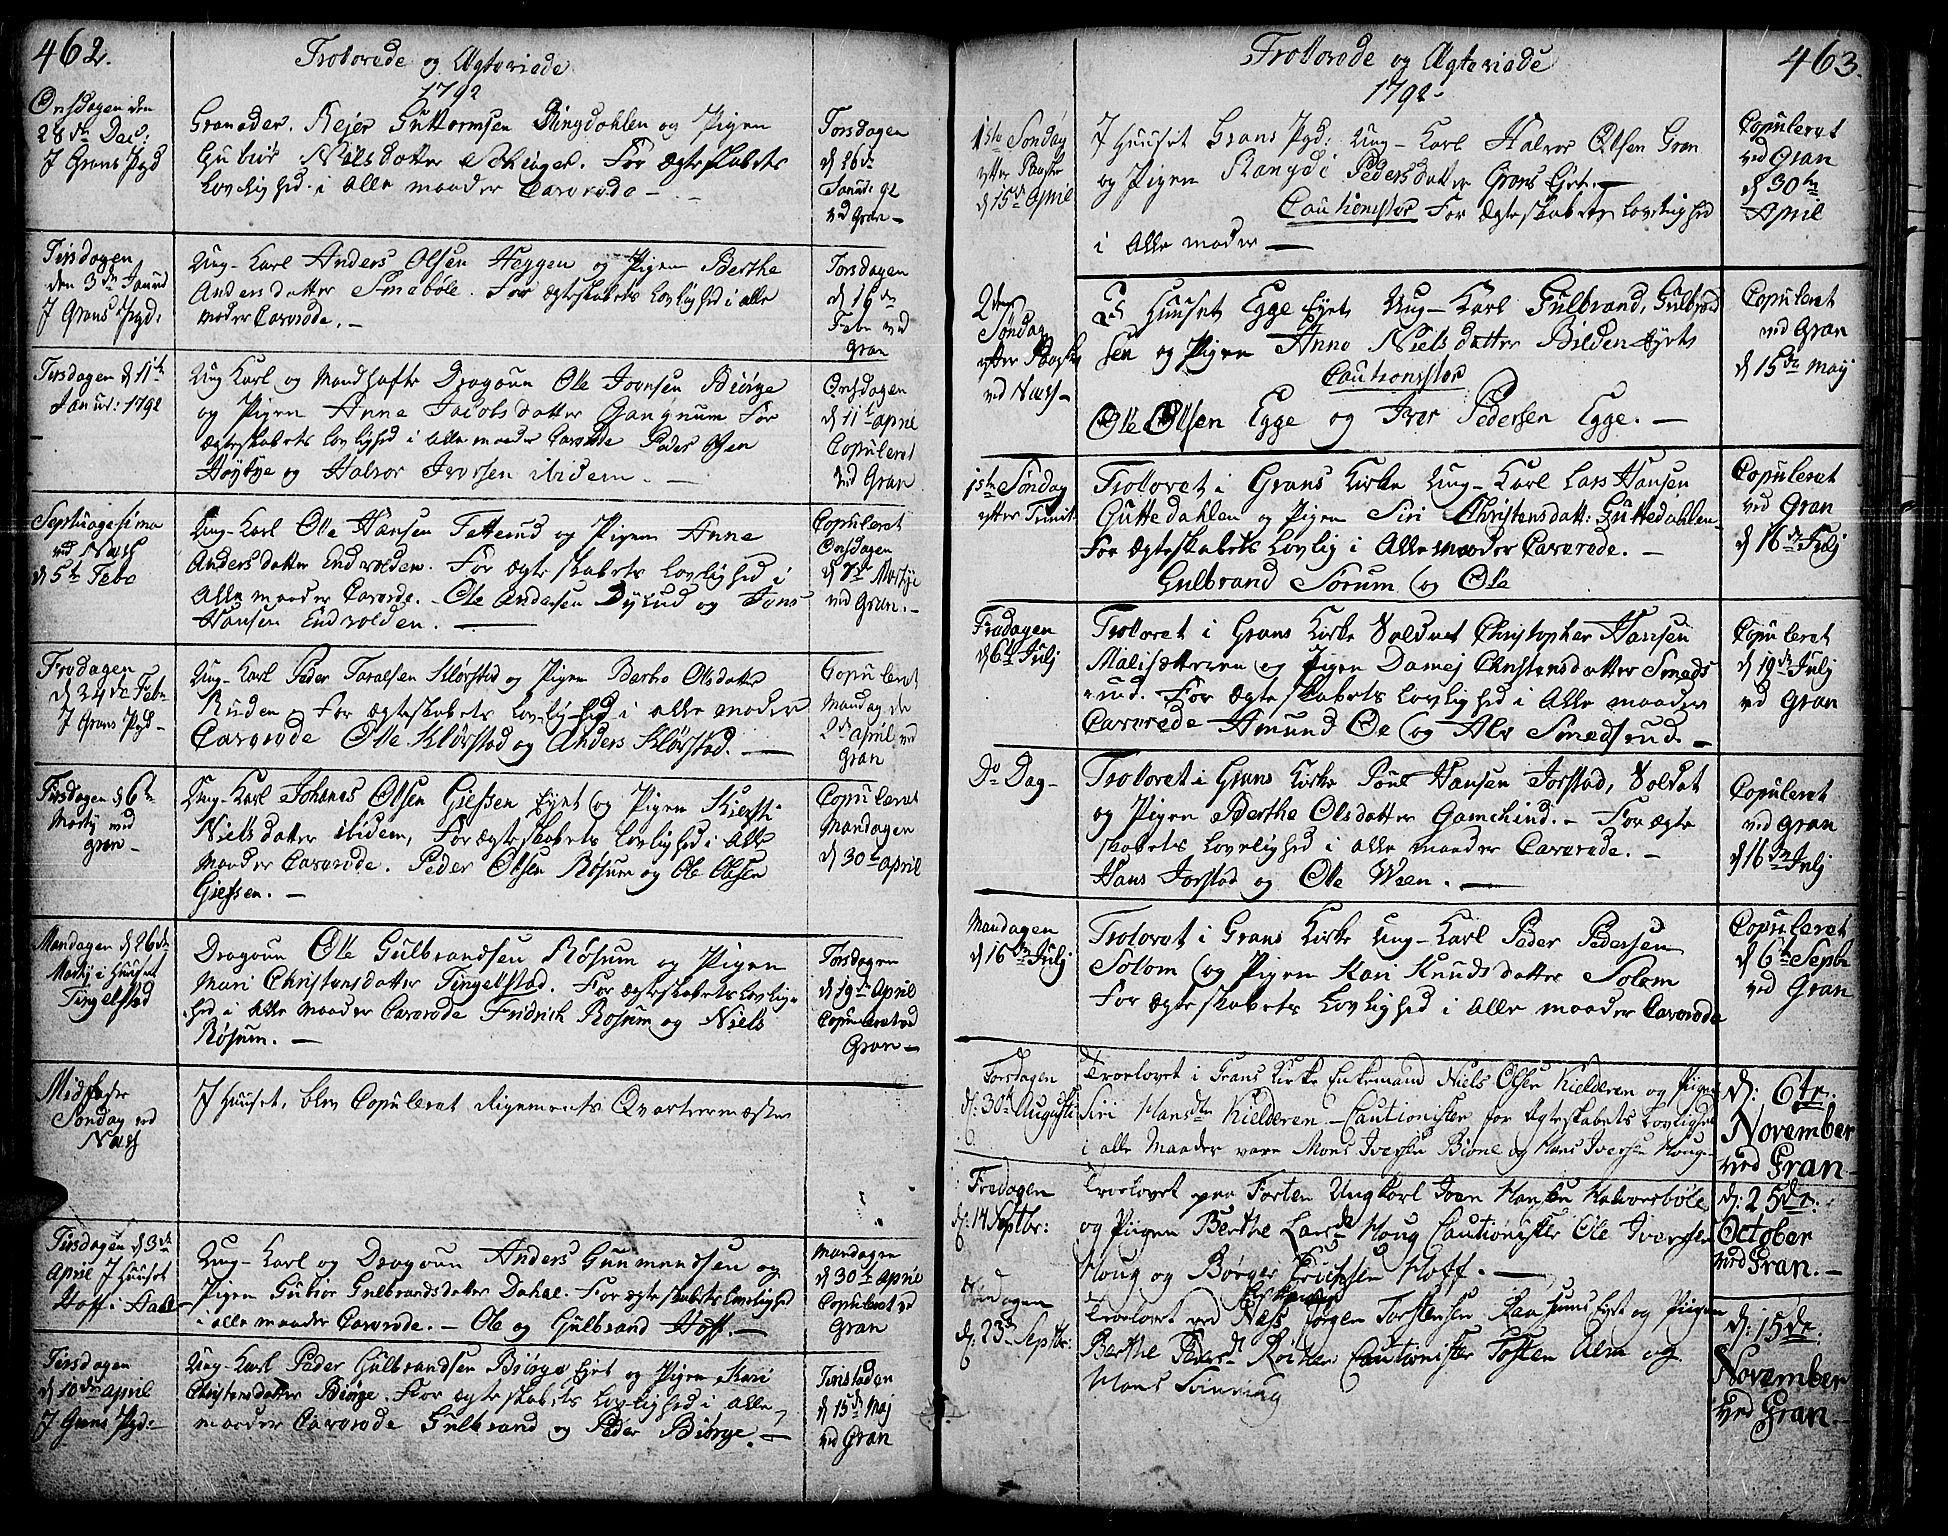 SAH, Gran prestekontor, Ministerialbok nr. 6, 1787-1824, s. 462-463